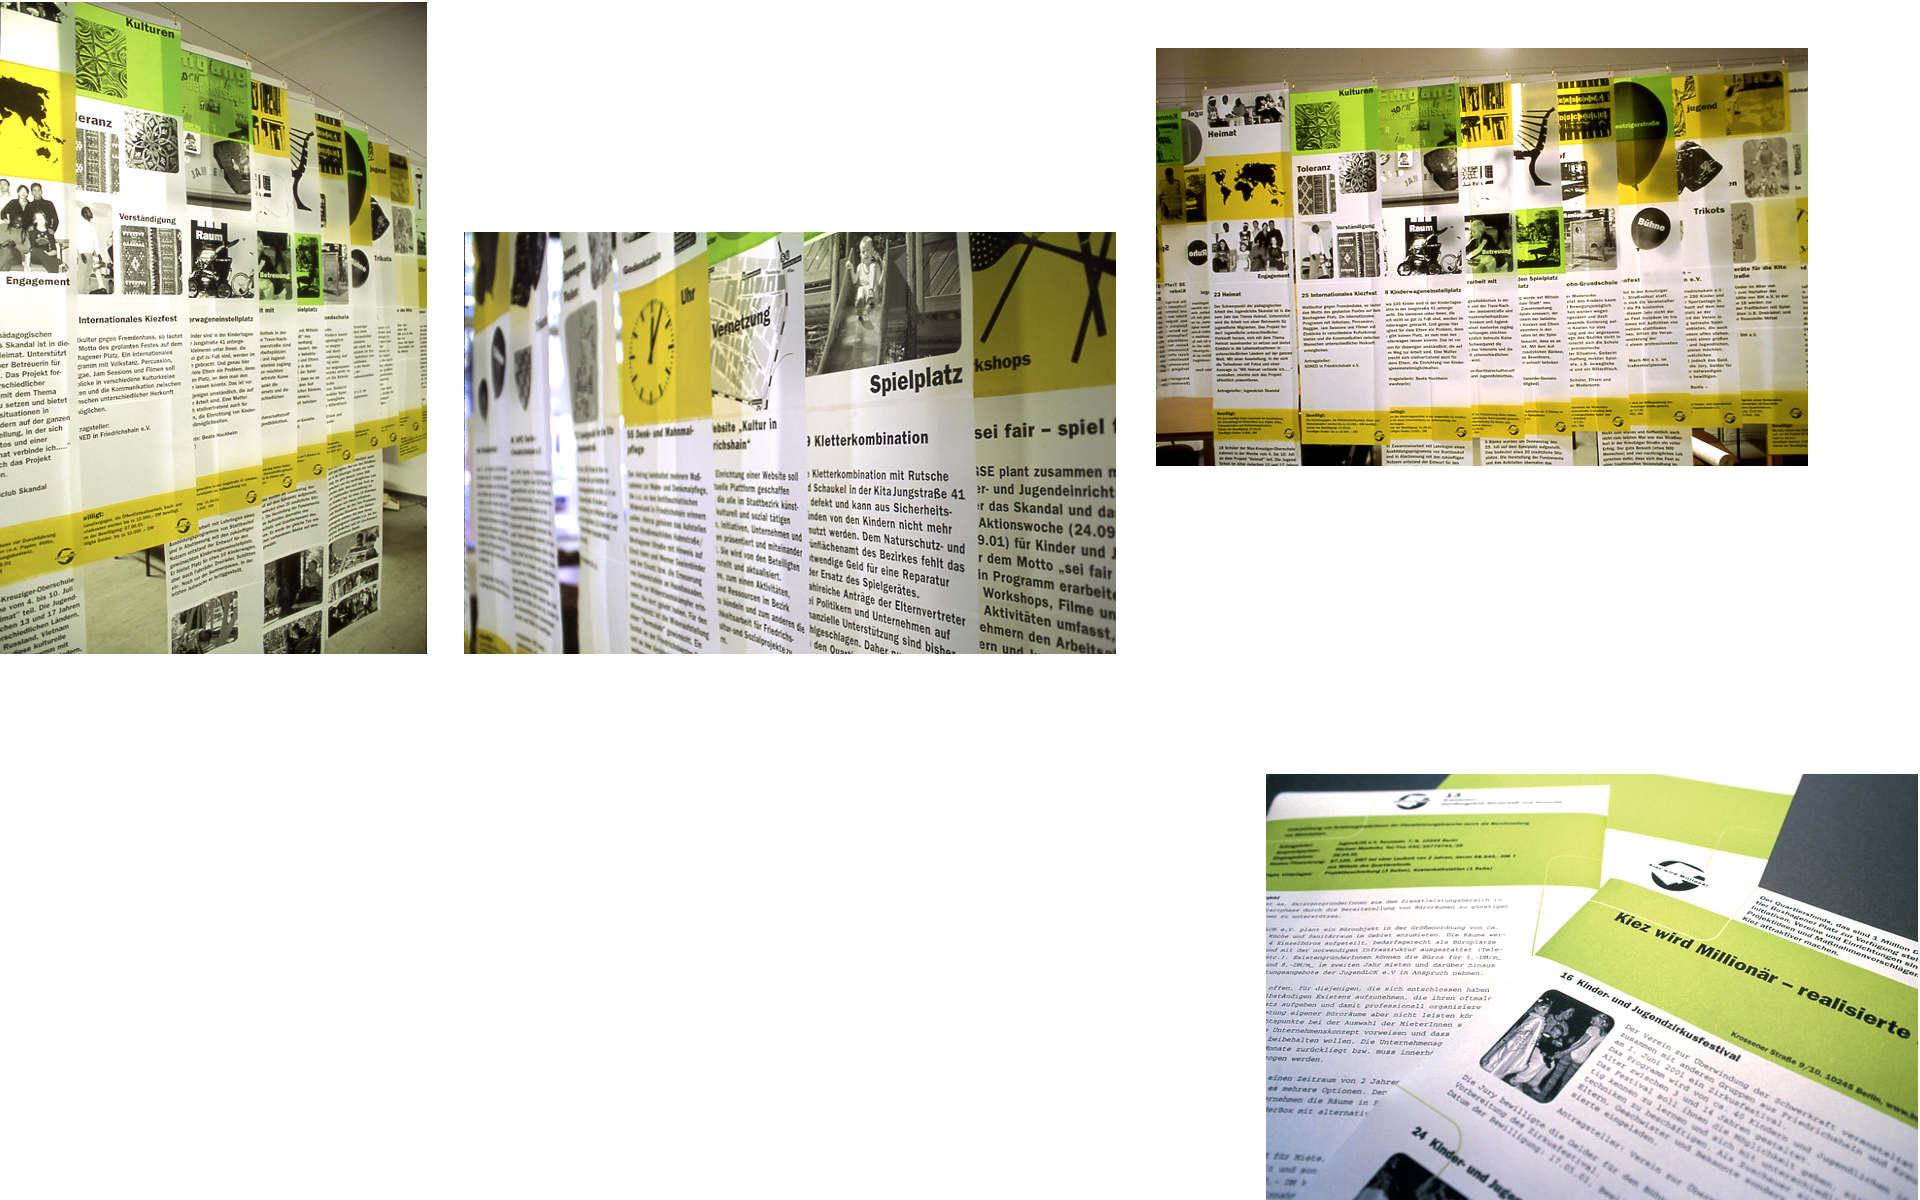 Boxhagenerplatz Quartiersmanagement Ausstellungsgestaltung Grafik Design